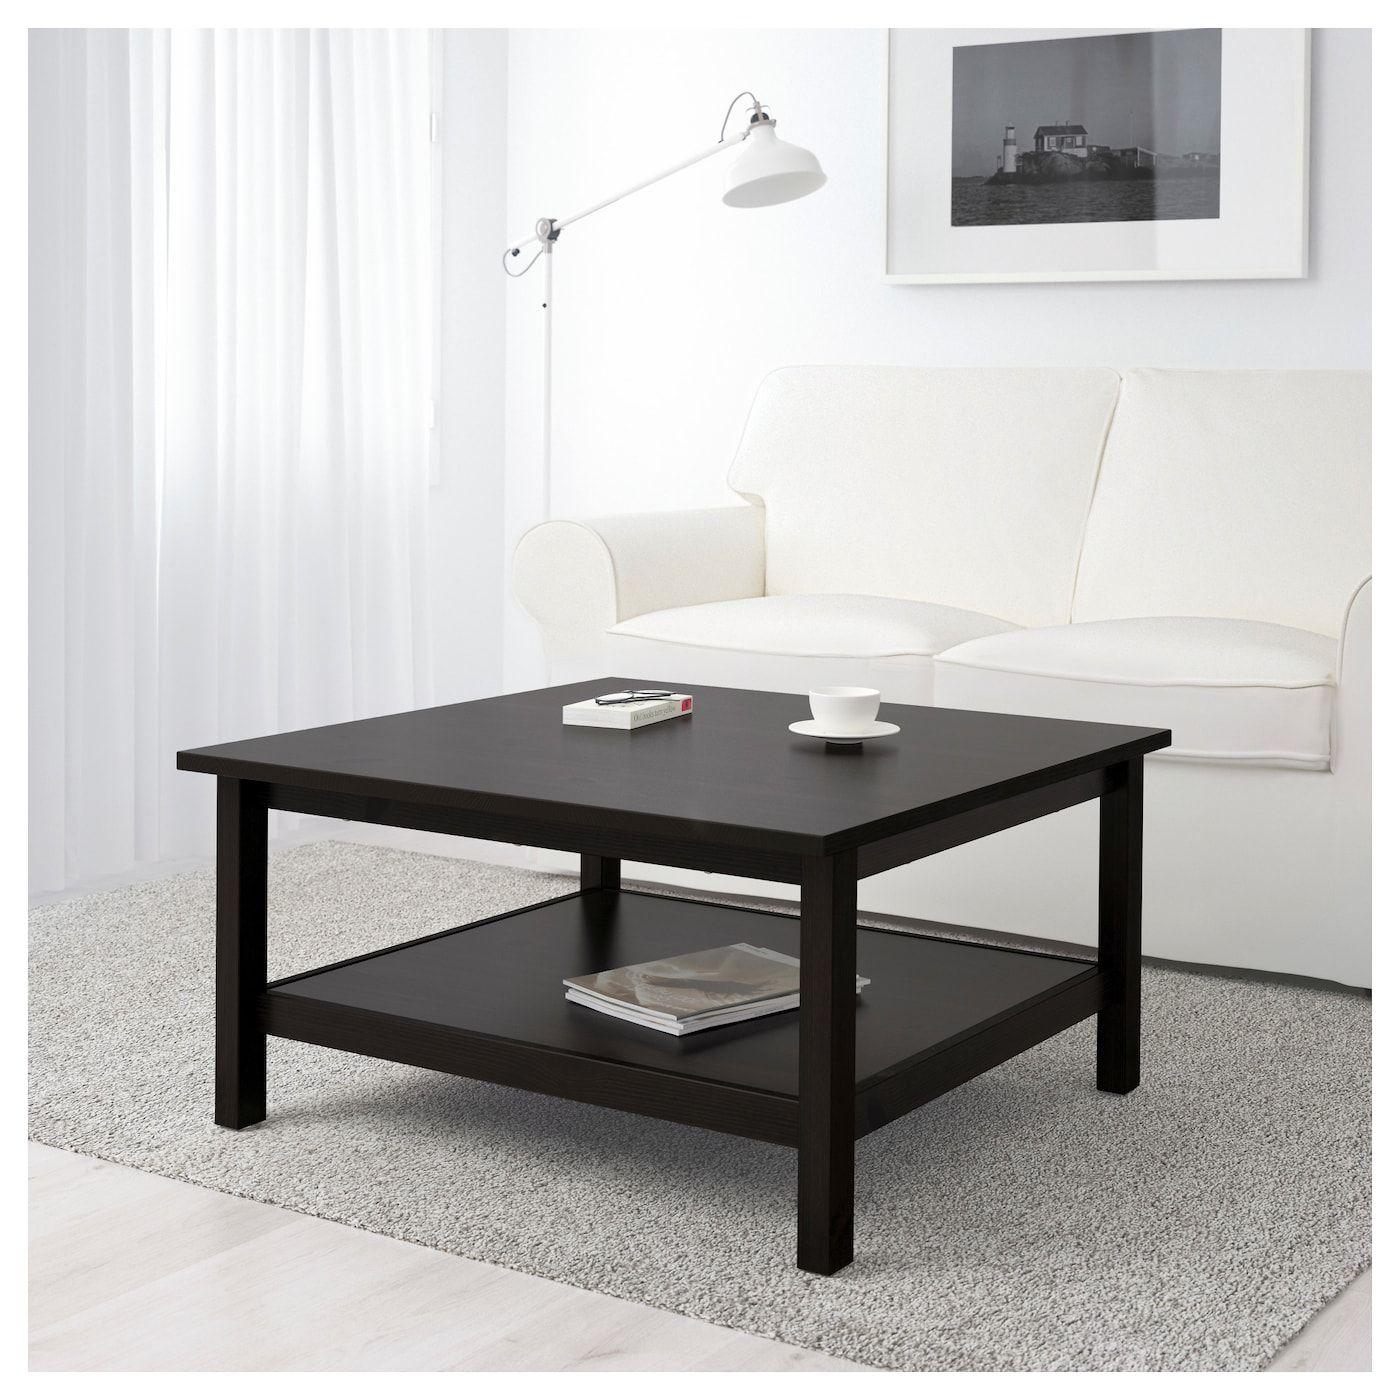 Https Www Ikea Com No No P Hemnes Bord Brunsvart 10176292 Ikea Ikea Coffee Table Ikea Hemnes Coffee Table Coffee Table White [ 1400 x 1400 Pixel ]